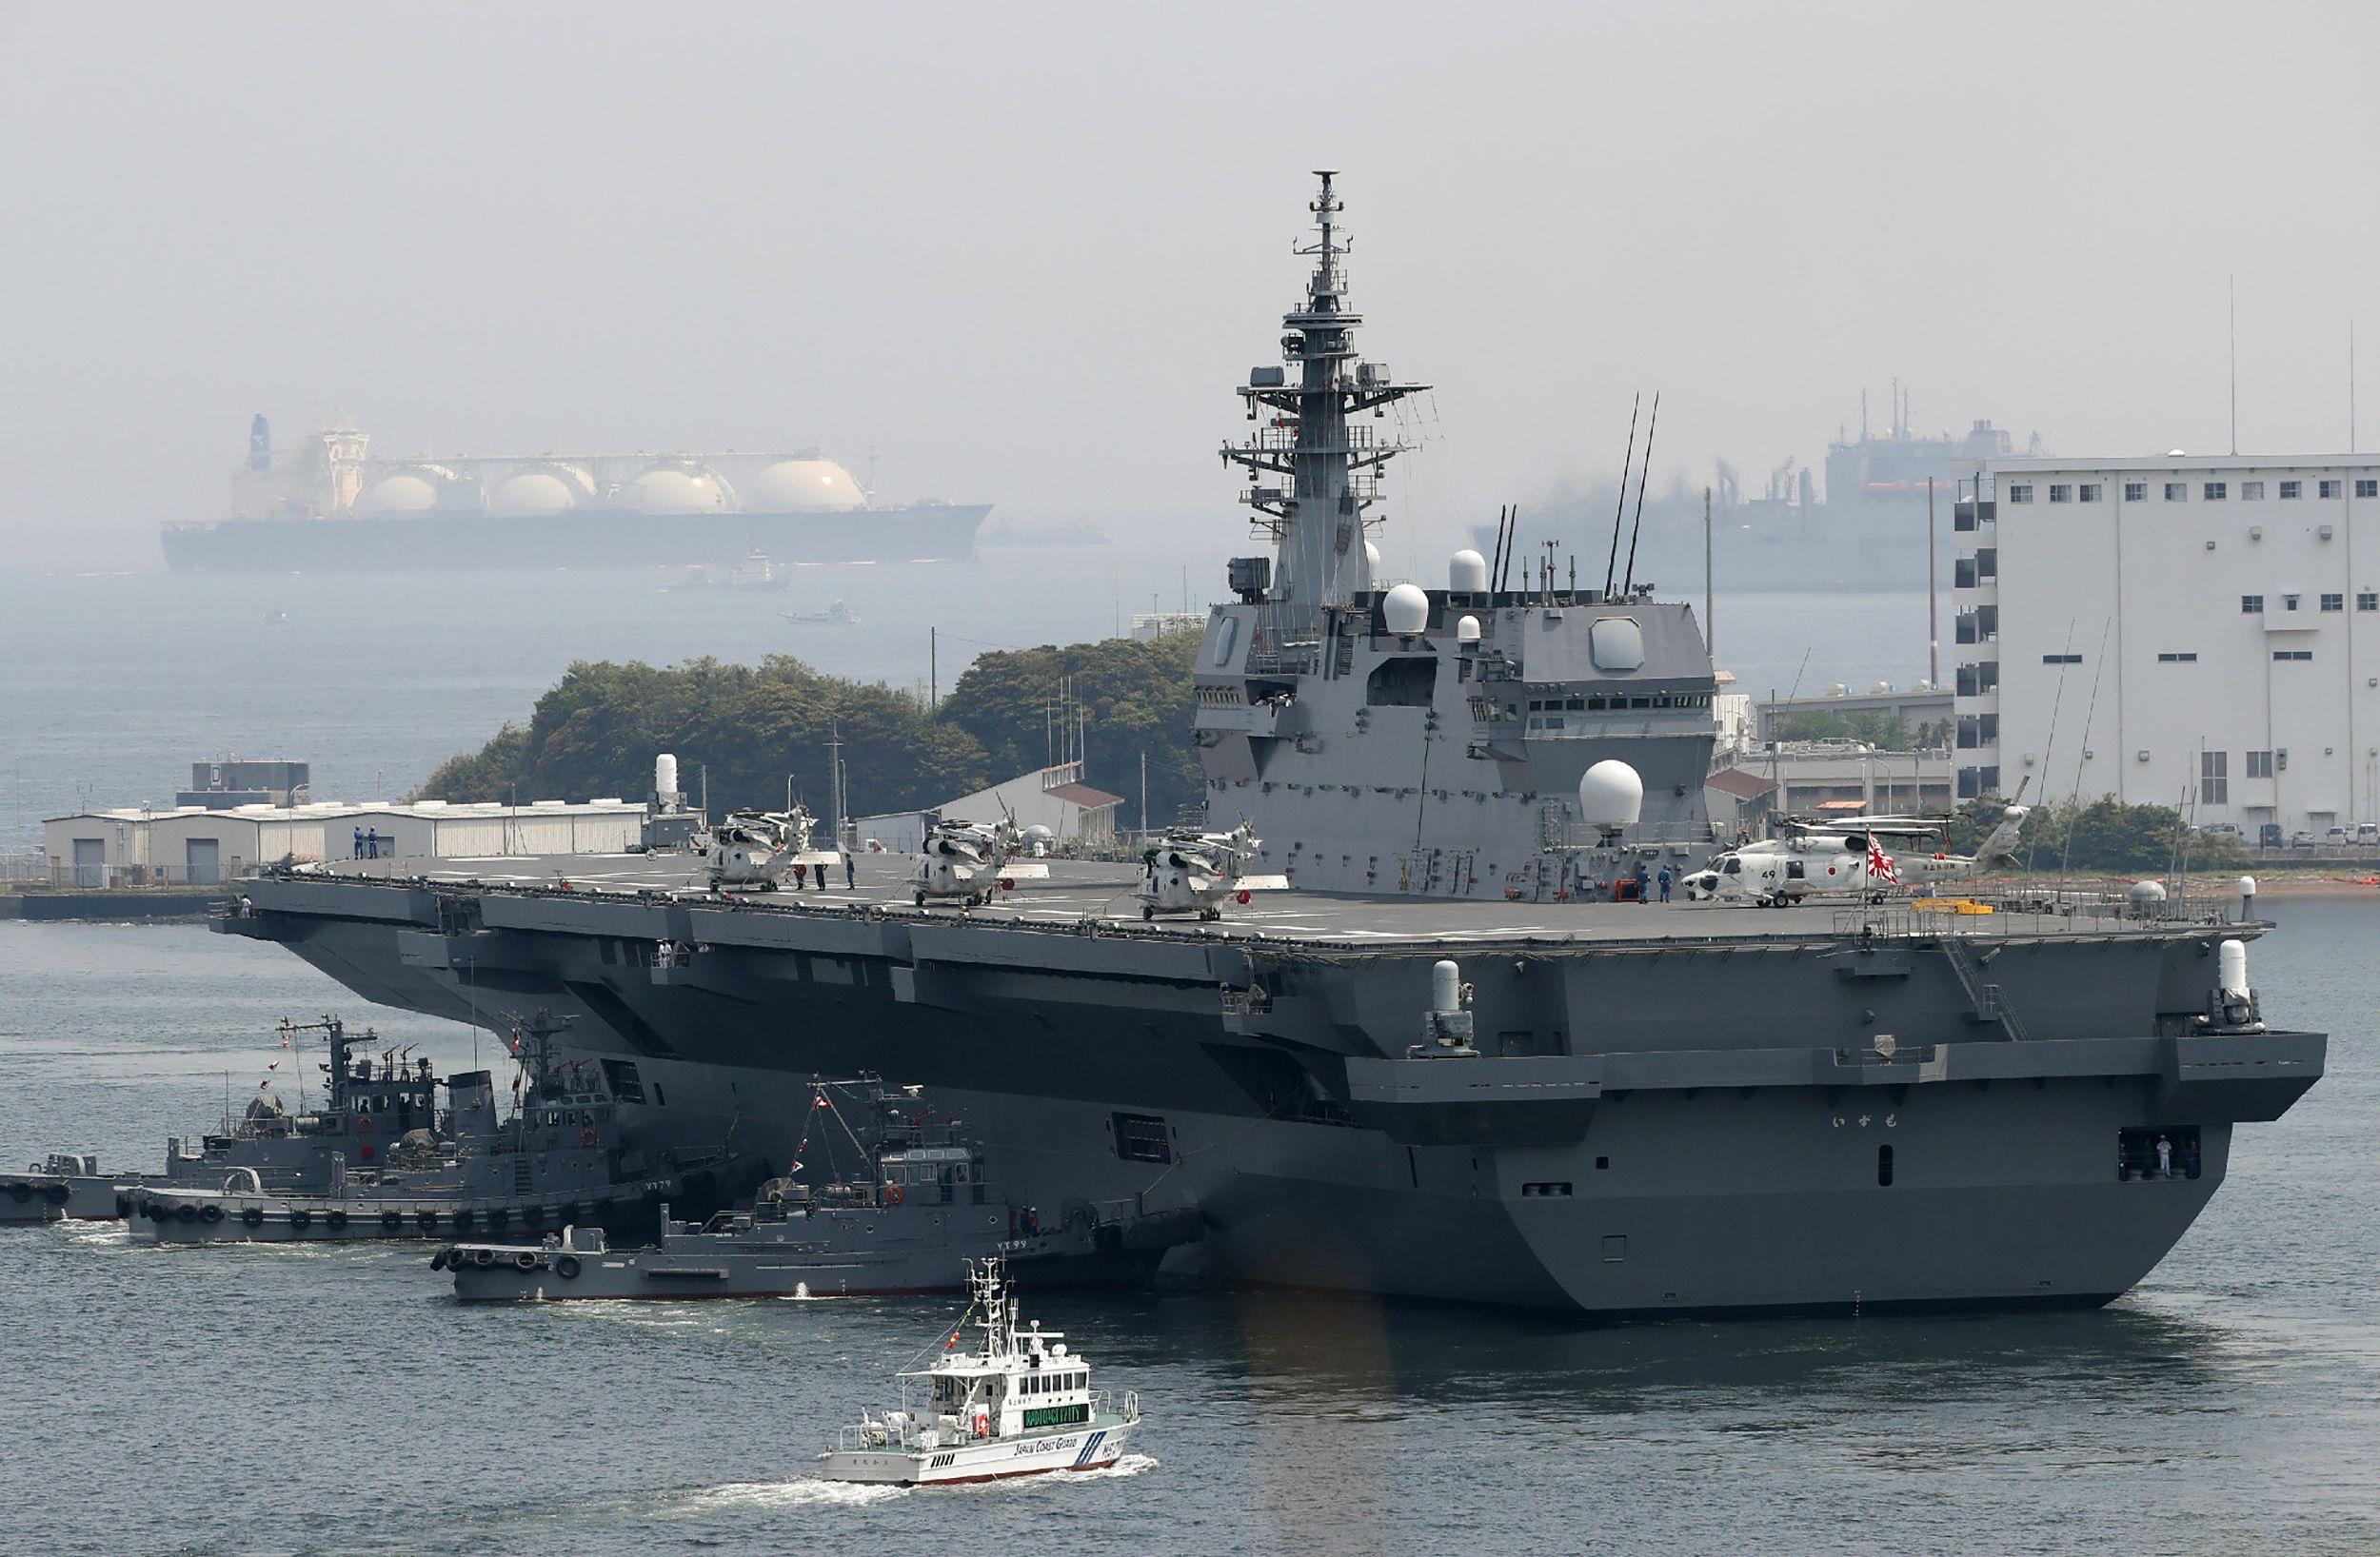 Hoi4 Ship Designs